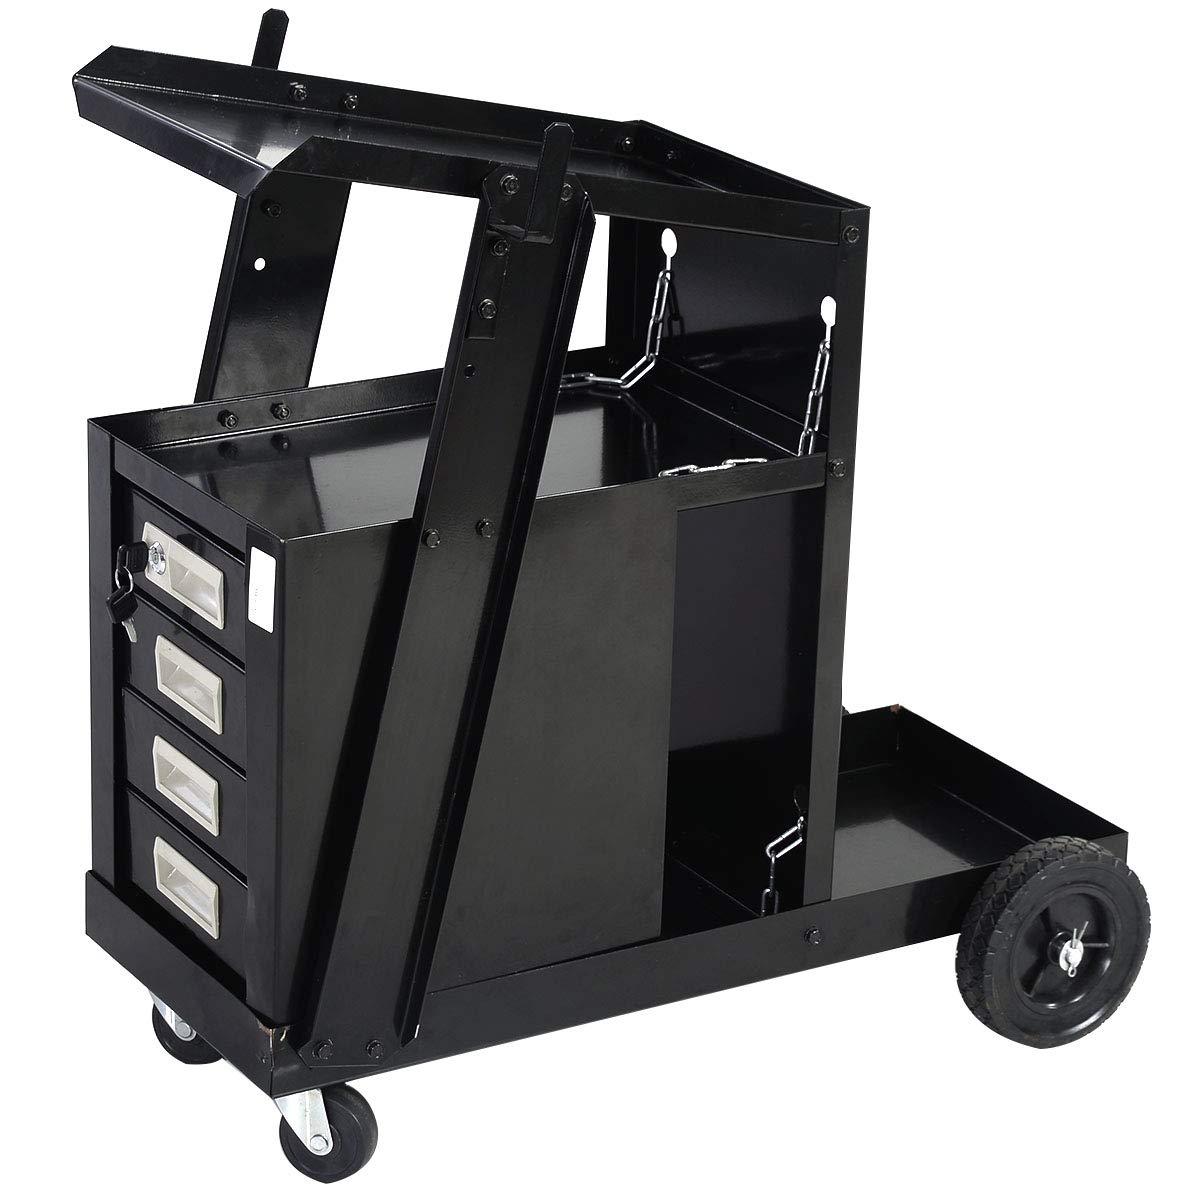 Goplus Welder Cart, MIG TIG ARC Welding Plasma Cutter Tank Storage w/2 Safety Chains, 100 Lb Capacity, Portable 4-Drawer Cabinet by Goplus